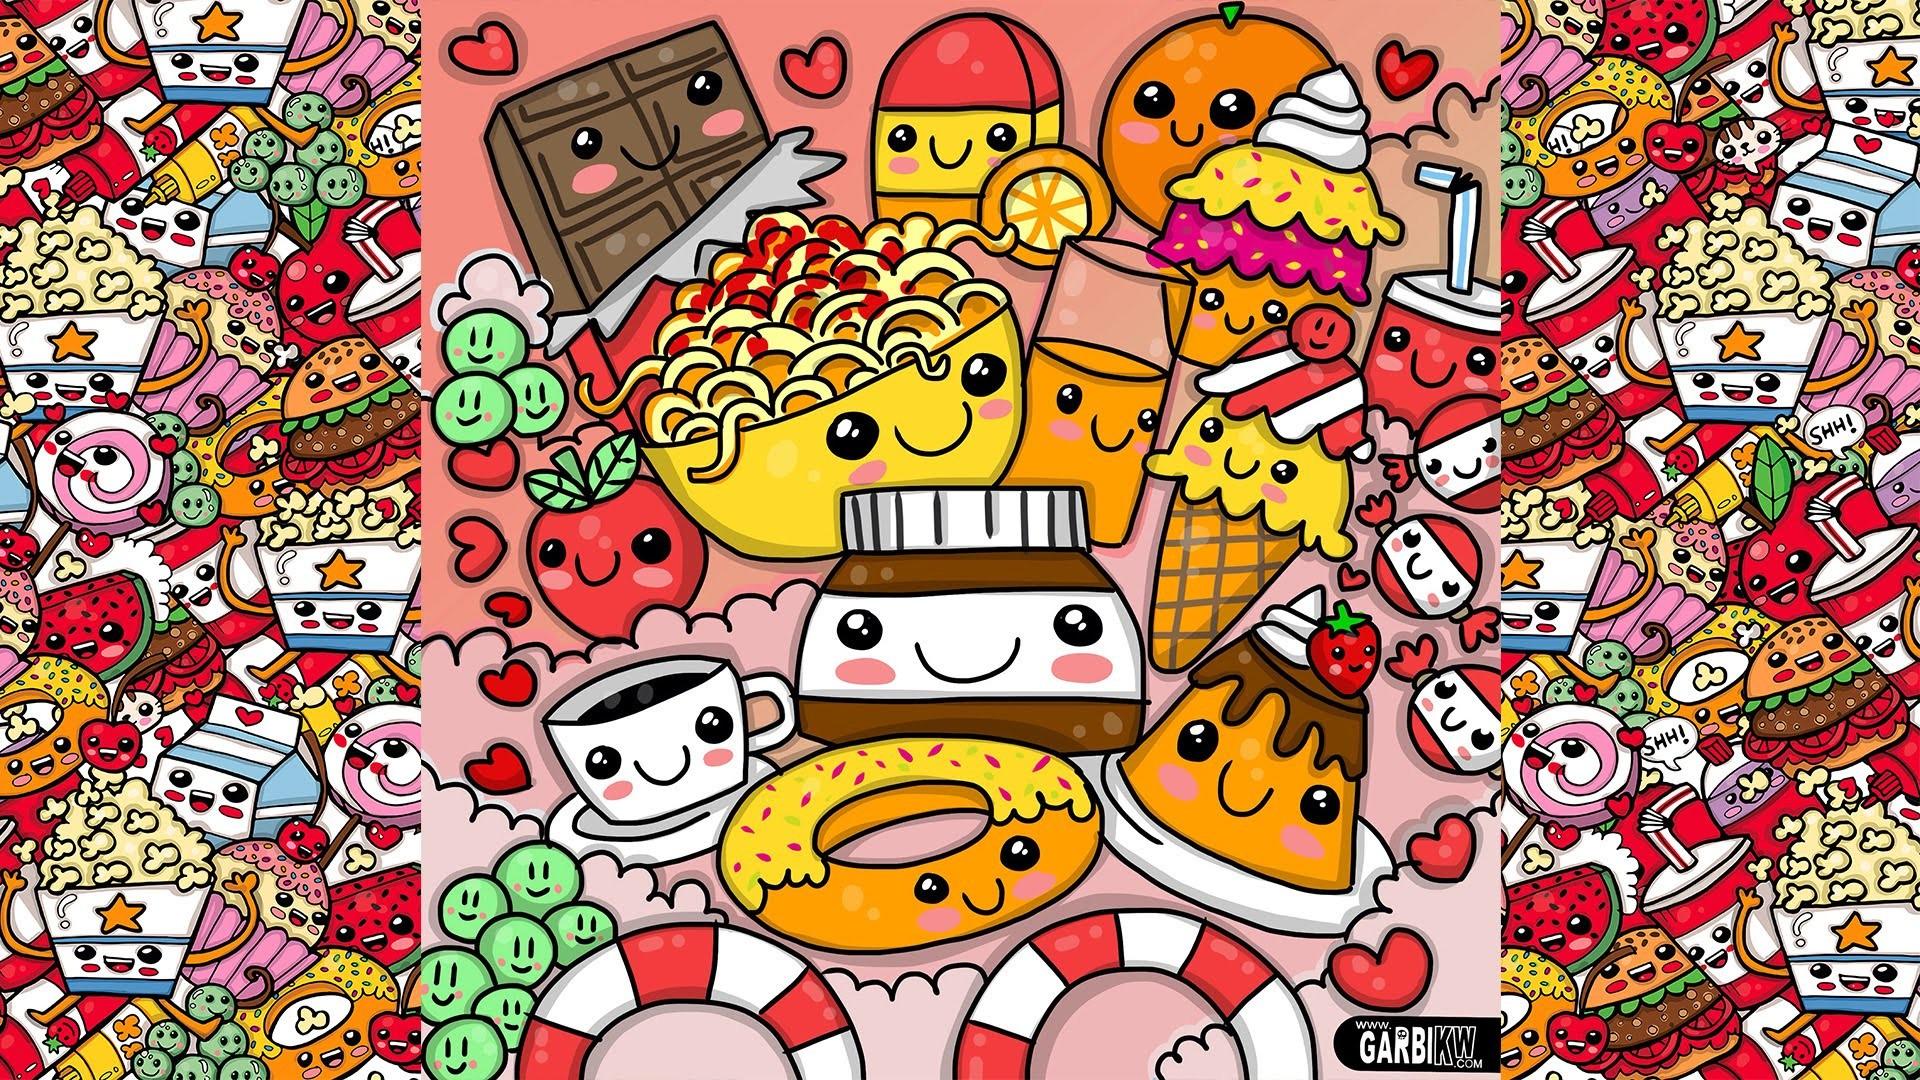 Cute Nutella Wallpapers Cute Cartoon Food Wallpapers 67 Images